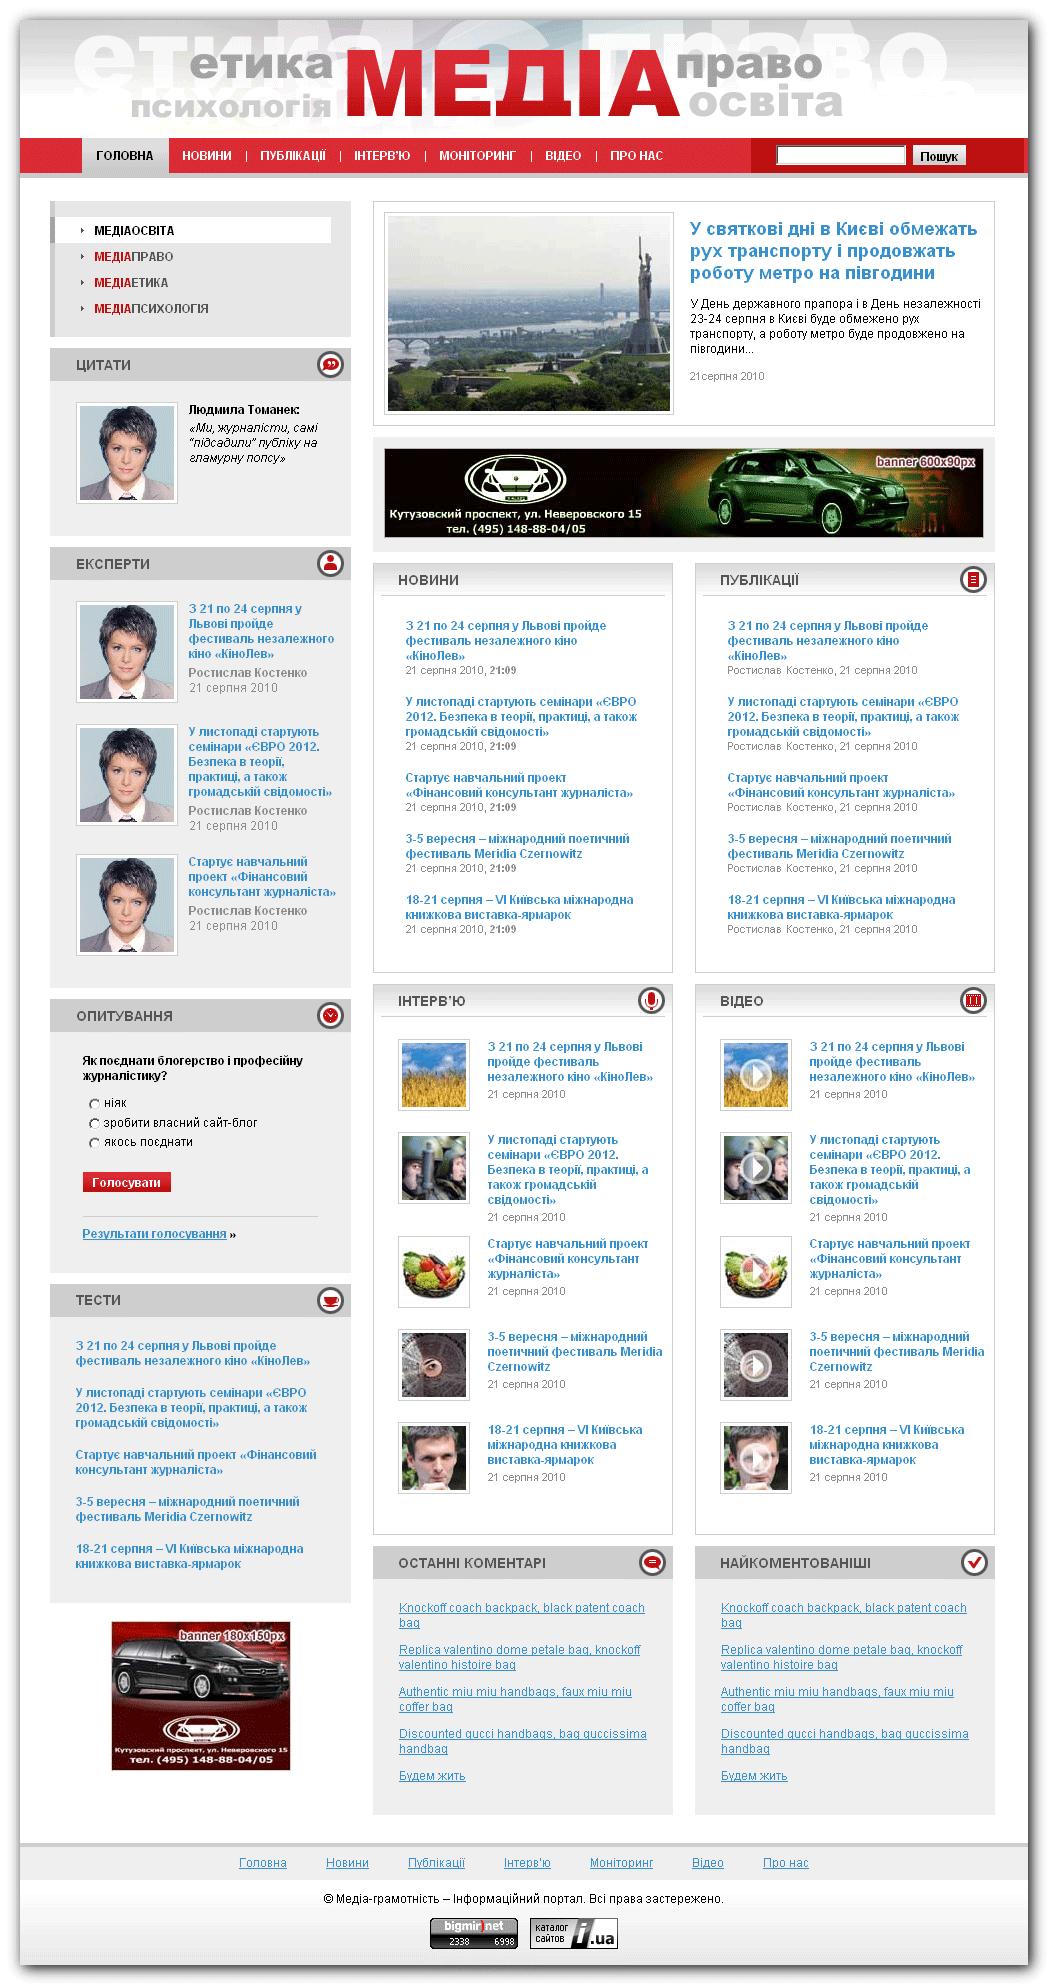 Верстка проекта «MEDIA»